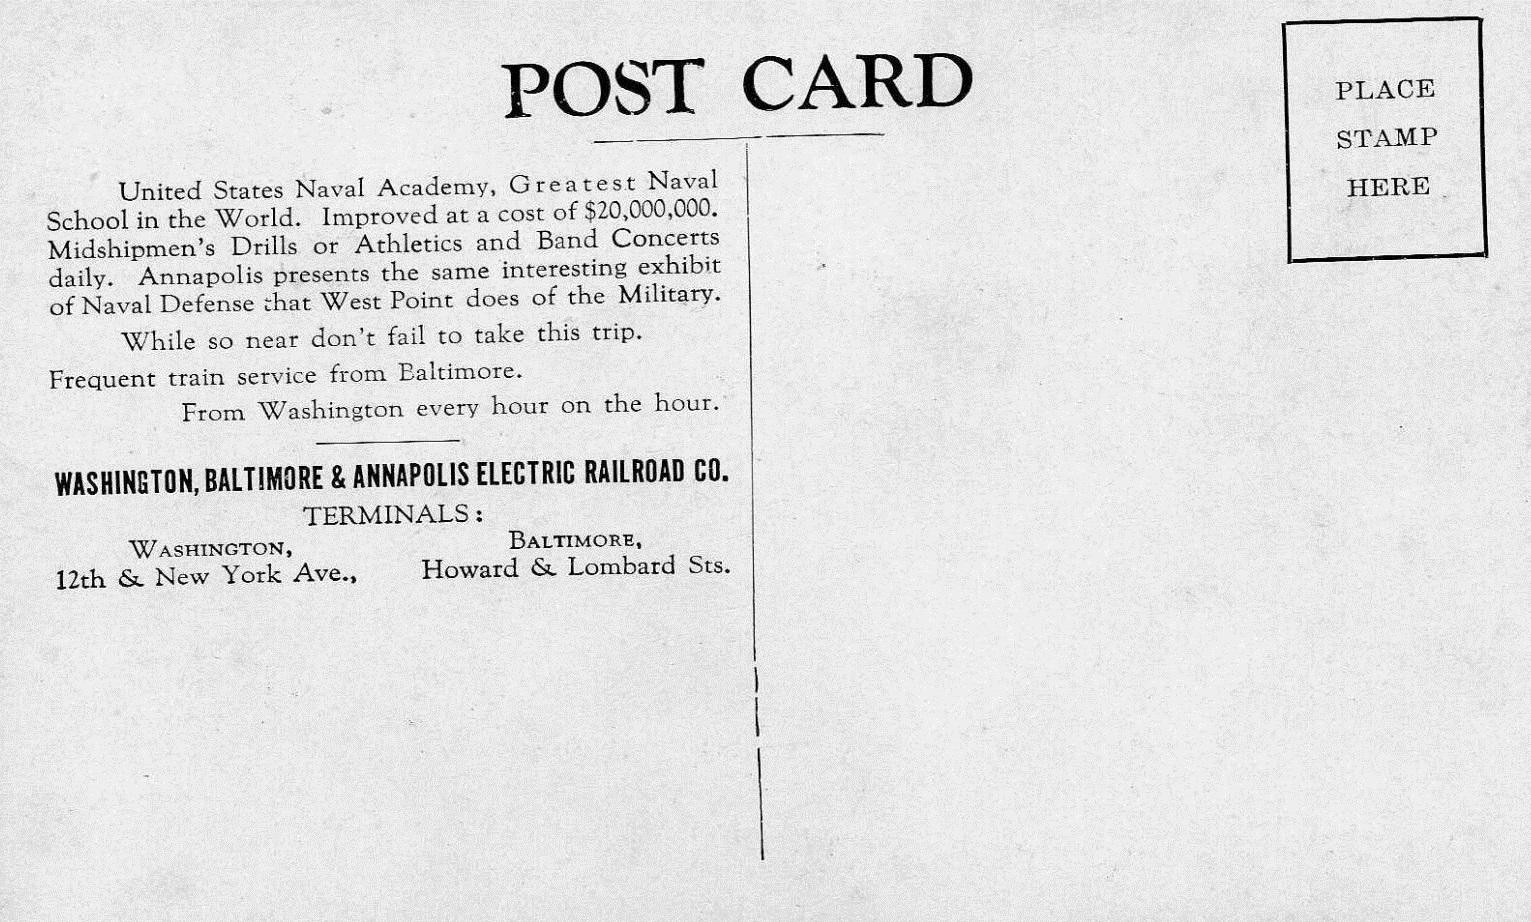 Washington-Baltimore-and-Annapolis-Railroad-Postcard-2-2.jpg